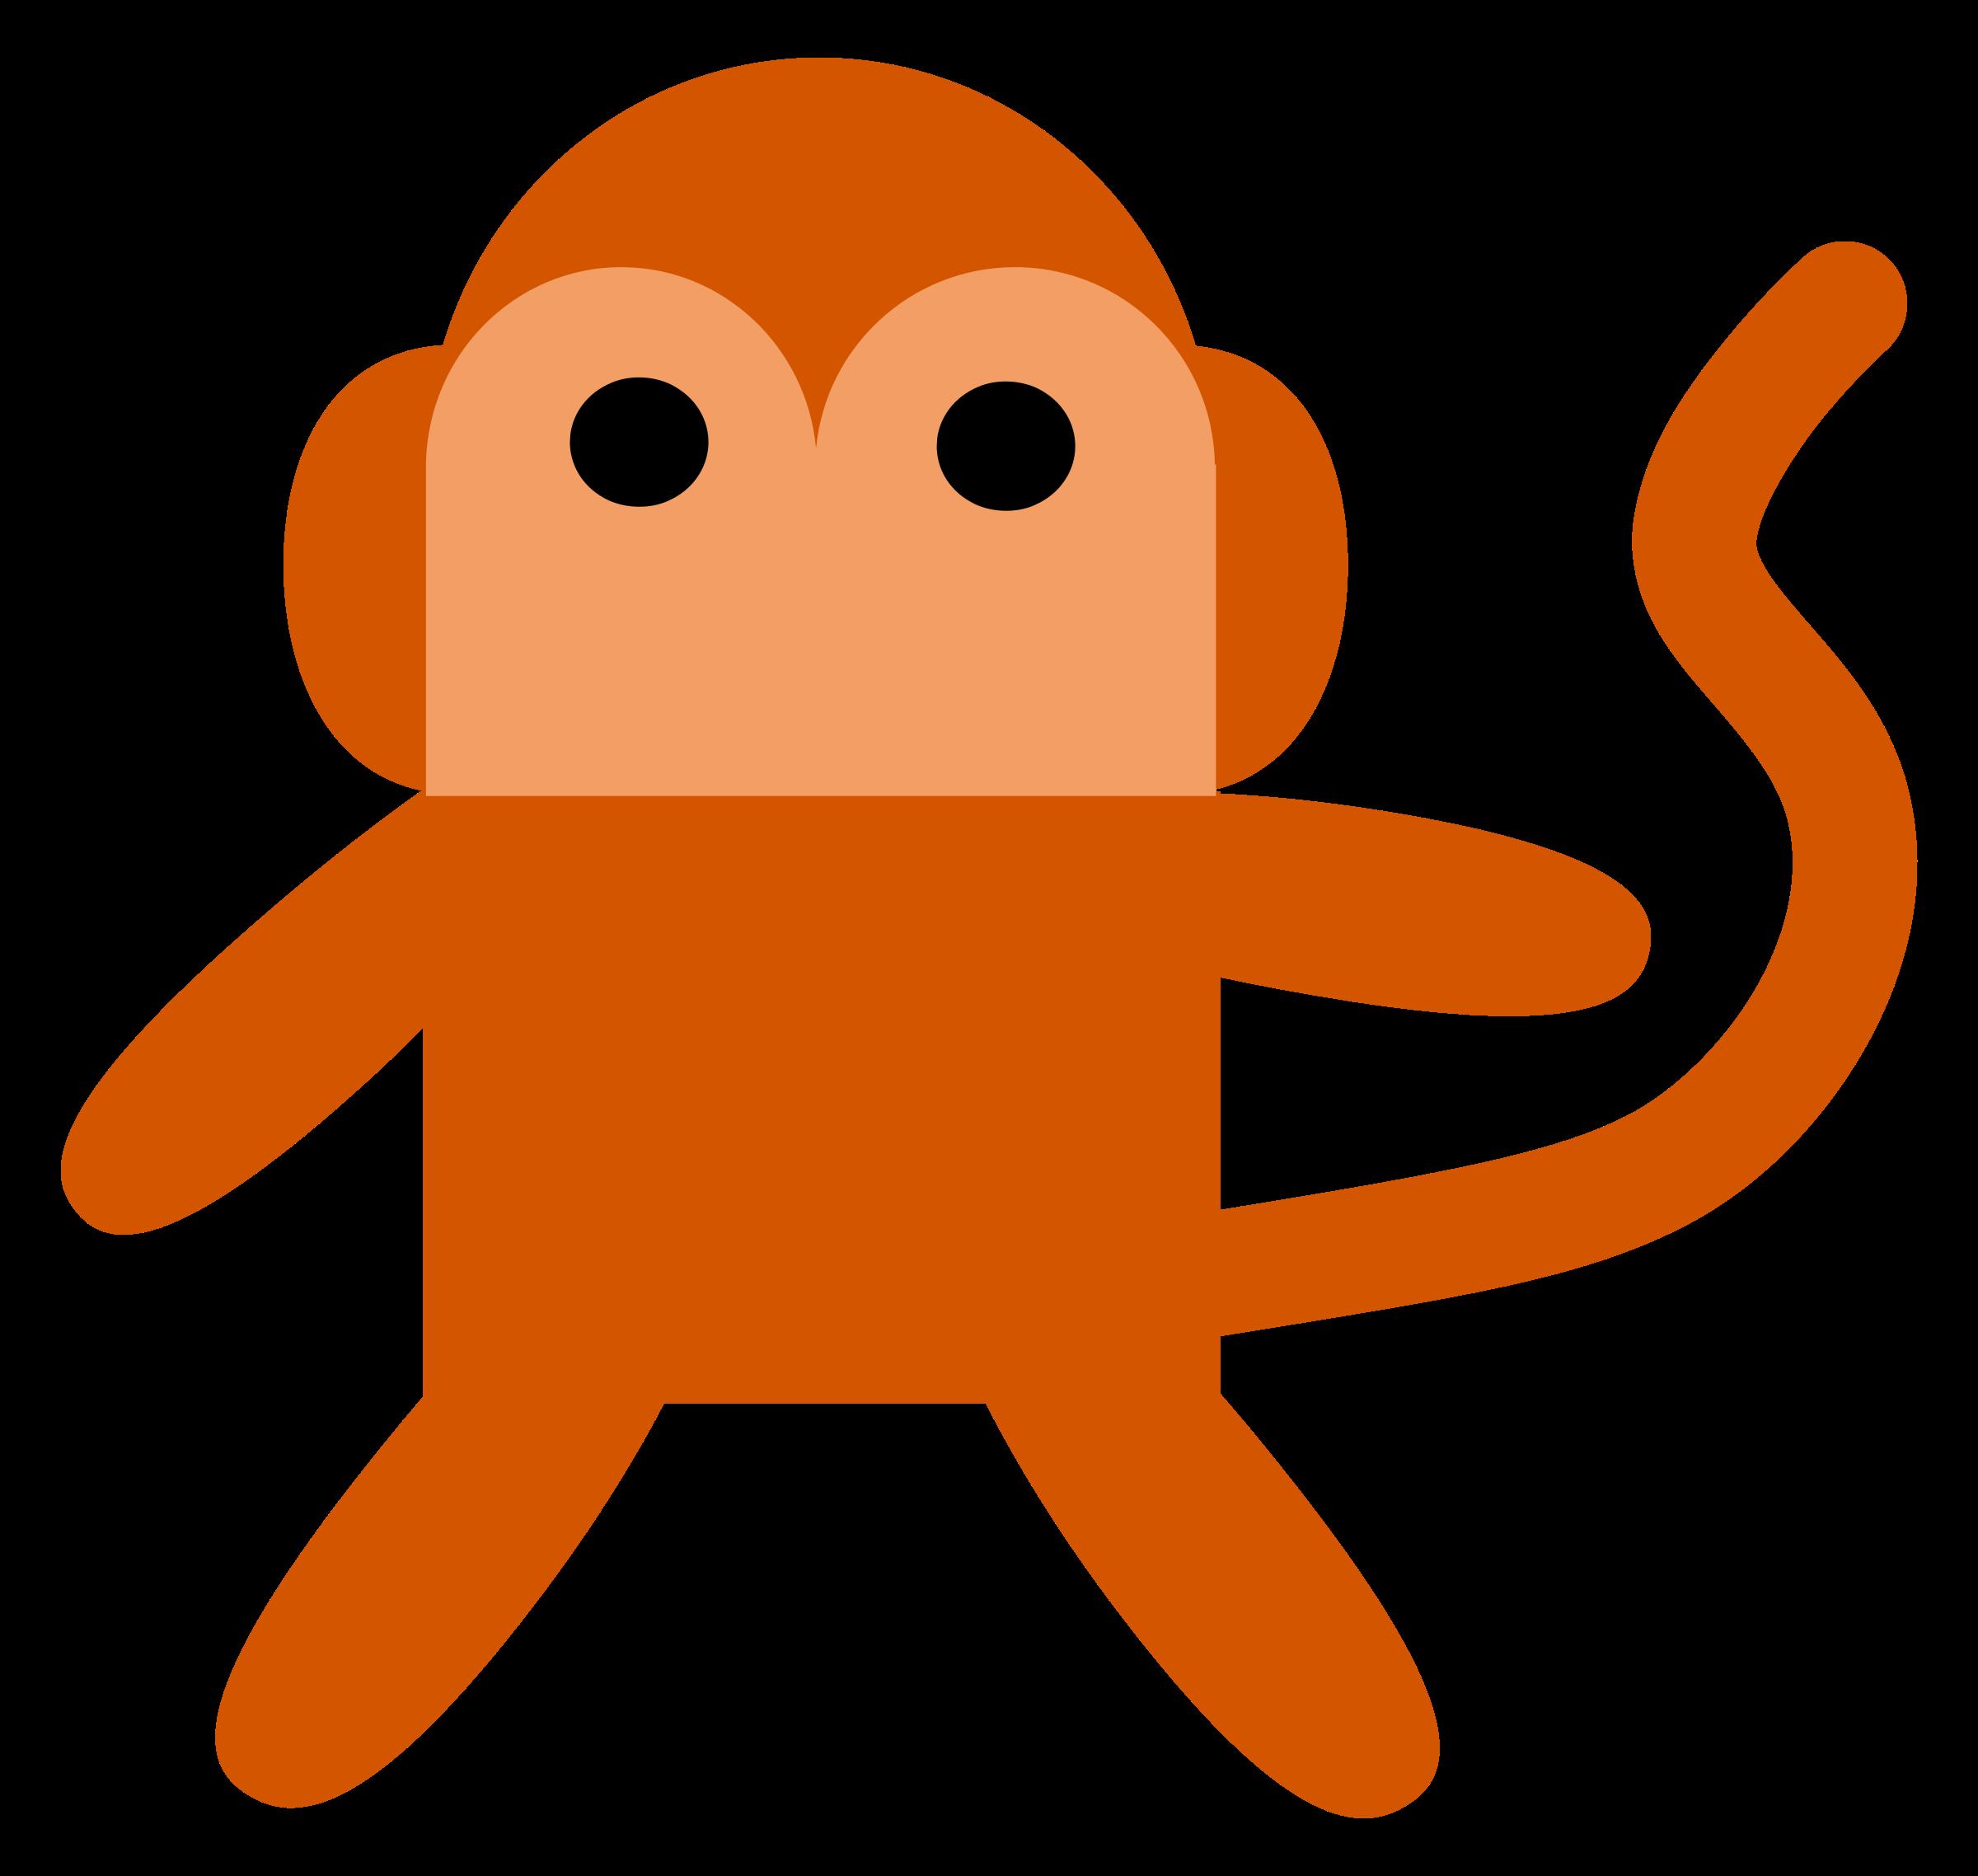 Big image png. Clipart monkey cheeky monkey